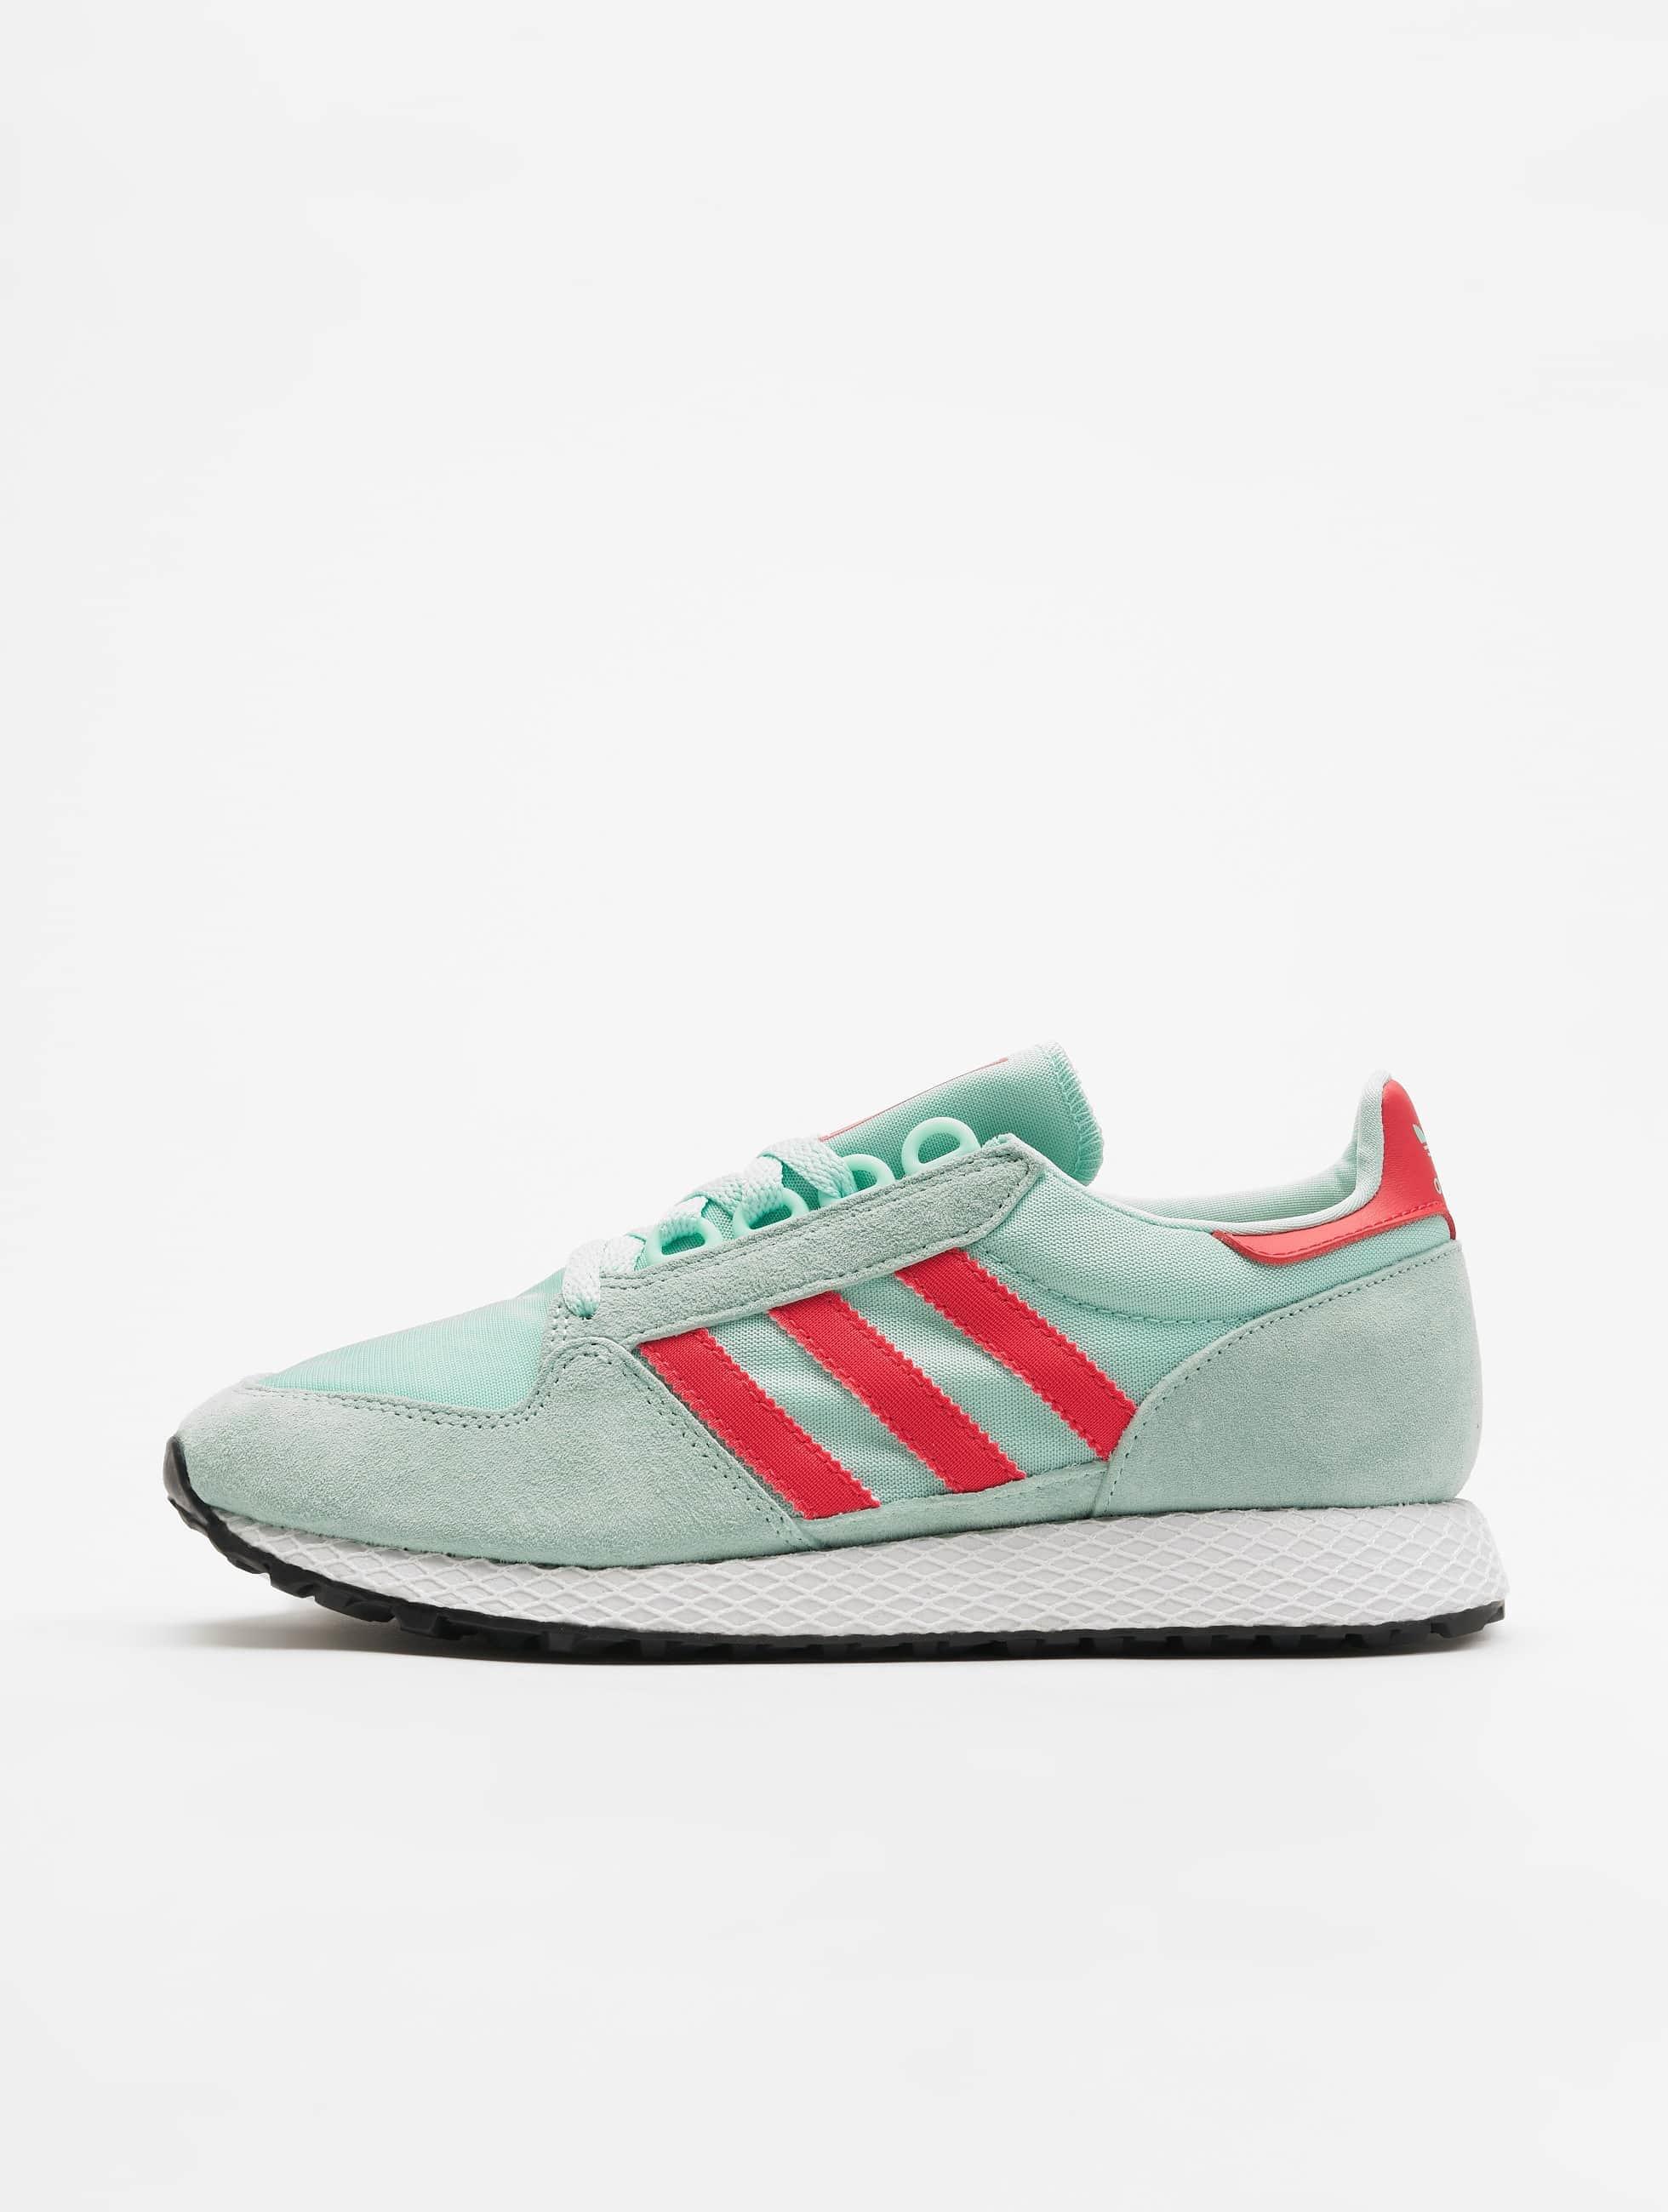 adidas Originals Forest Grove Damen Sneaker Clear Mint | Fun